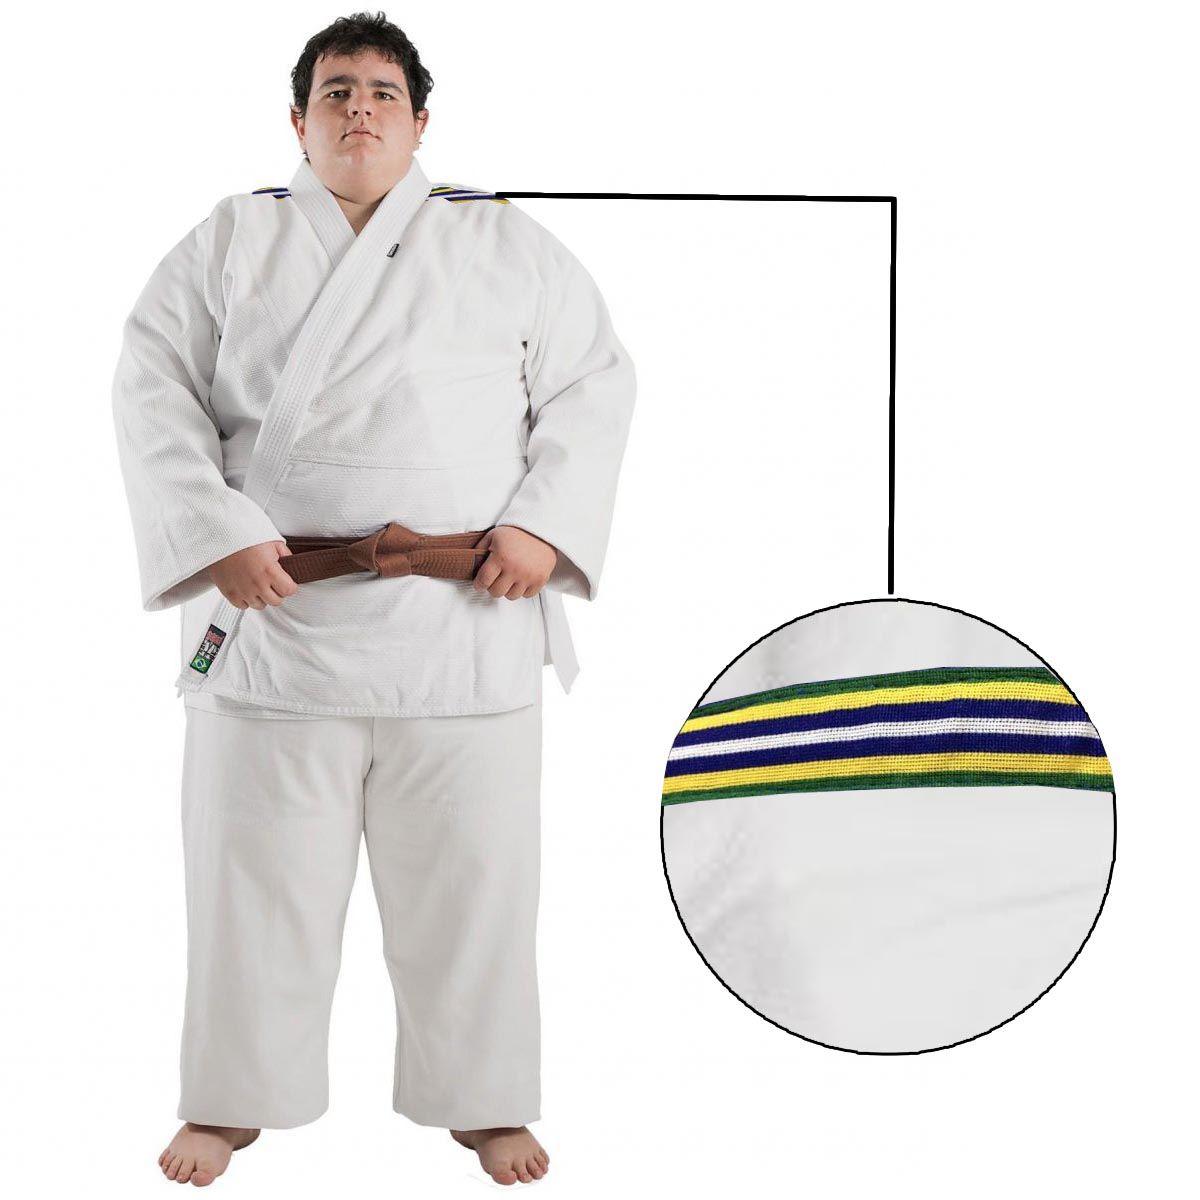 Kimono Judo - Trancado - Standart - Brazilian Colors - Shiroi - Branco -  - Loja do Competidor